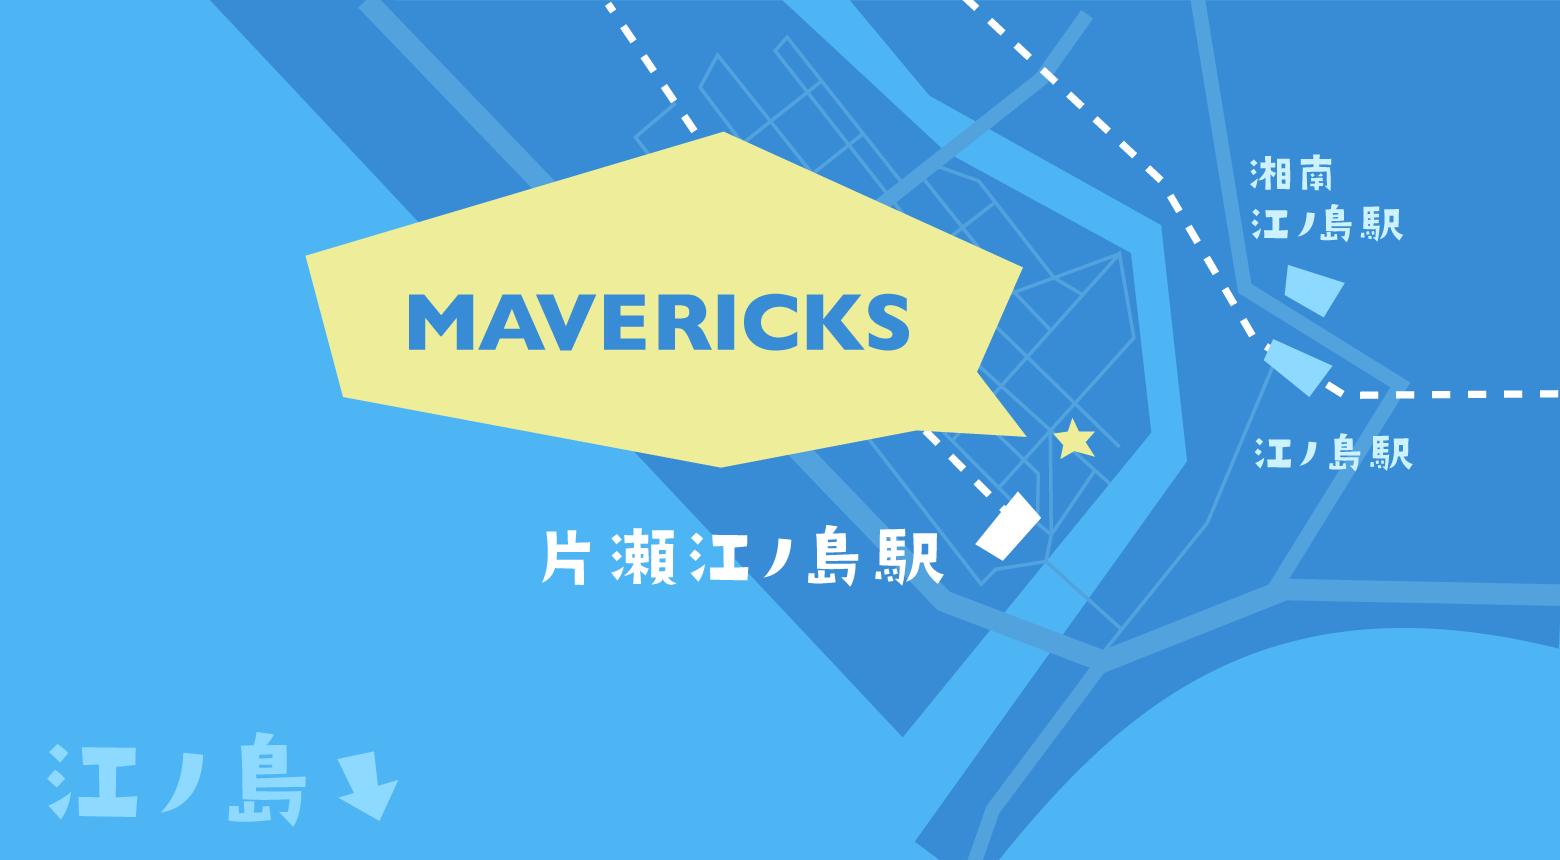 Marvericksアクセス地図